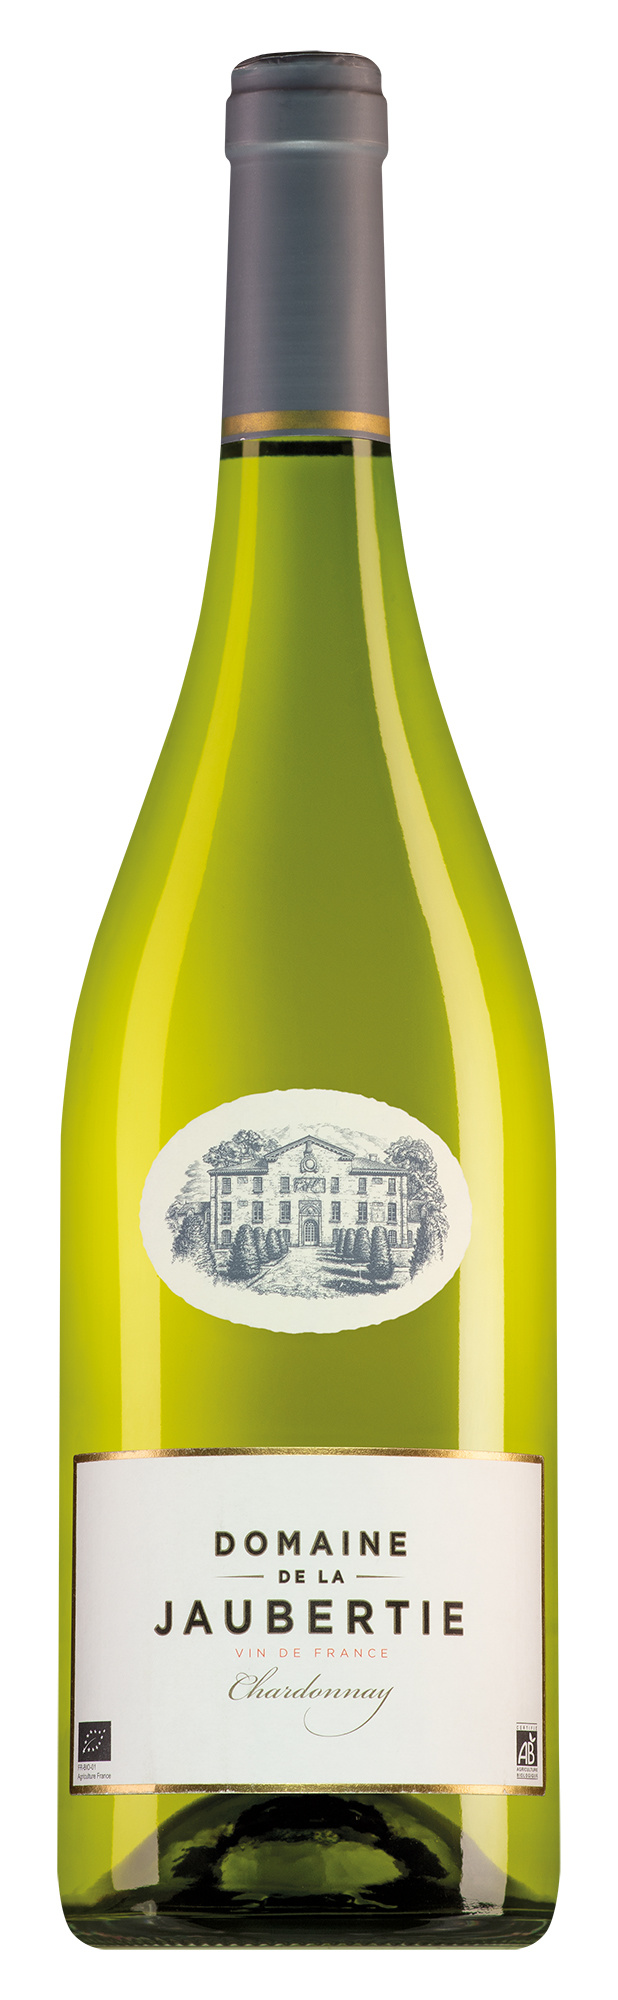 Domaine de la Jaubertie Périgord Chardonnay 2019